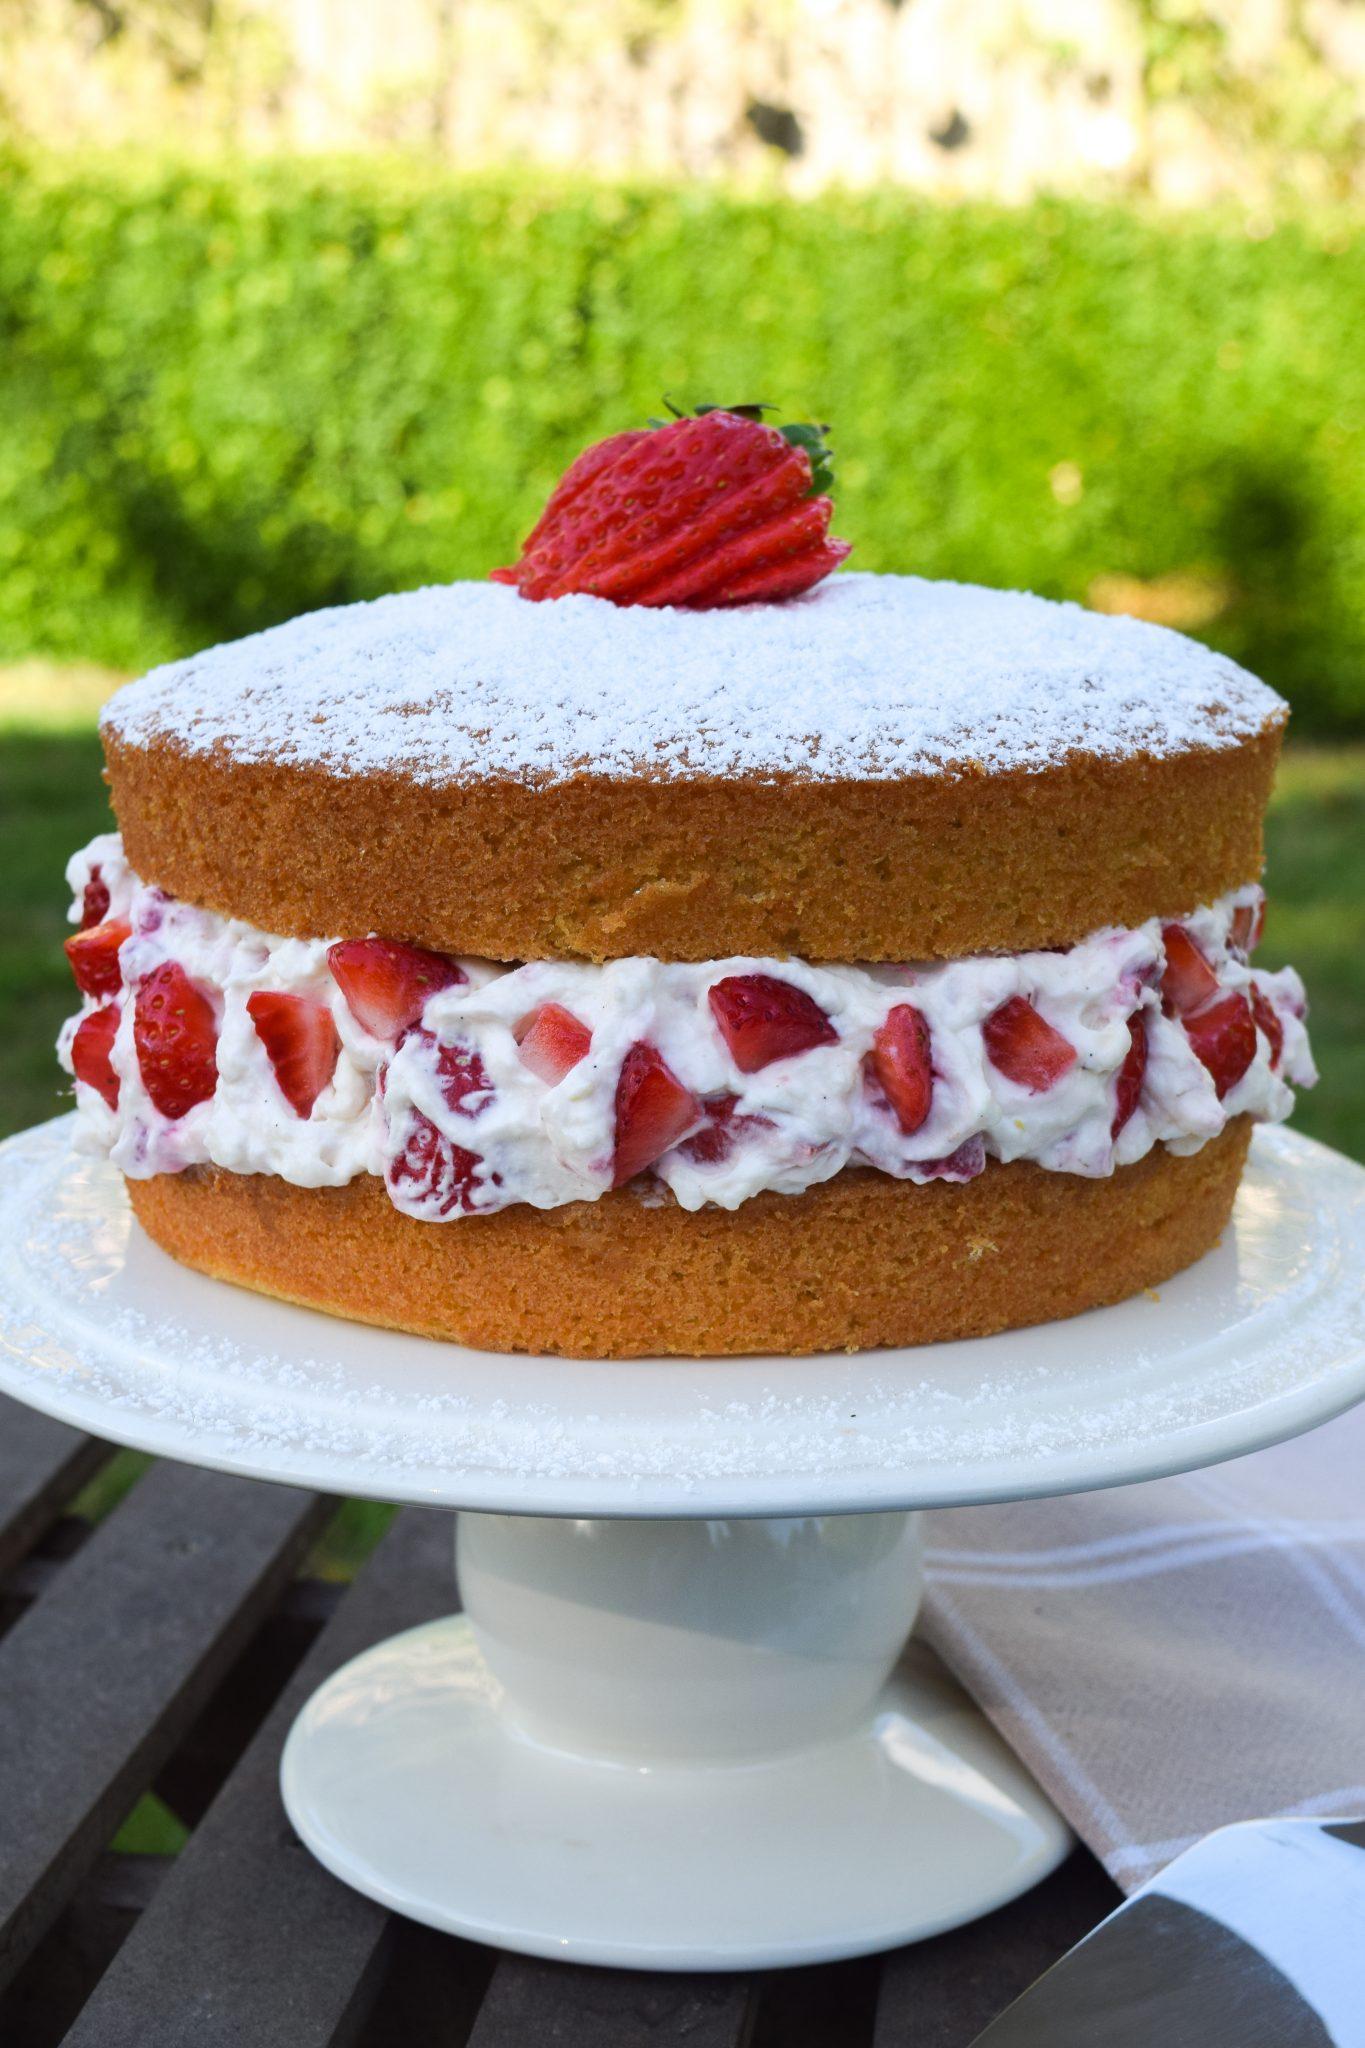 Vanilla sponge cake with strawberry buttercream